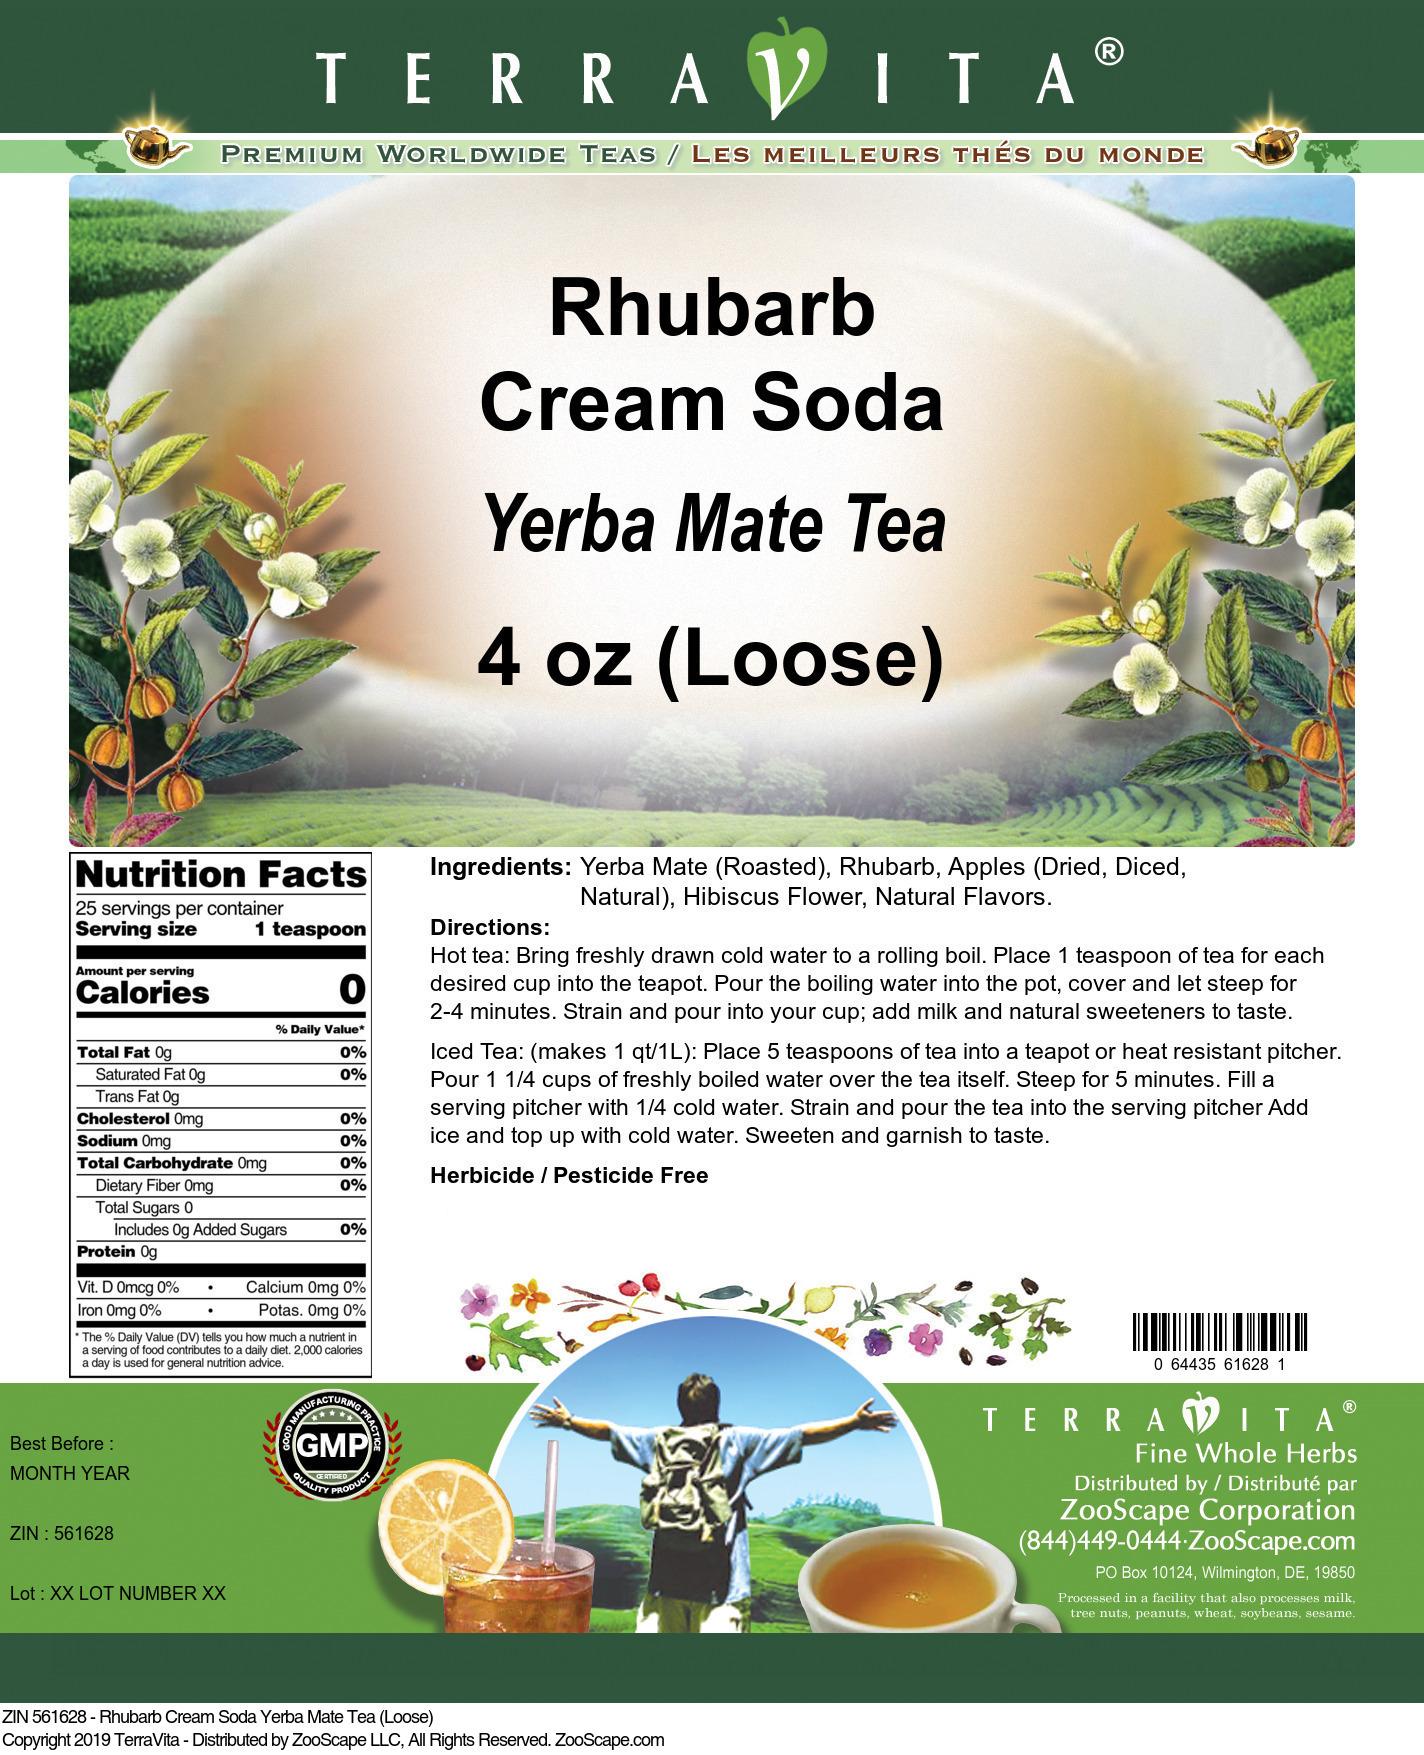 Rhubarb Cream Soda Yerba Mate Tea (Loose)